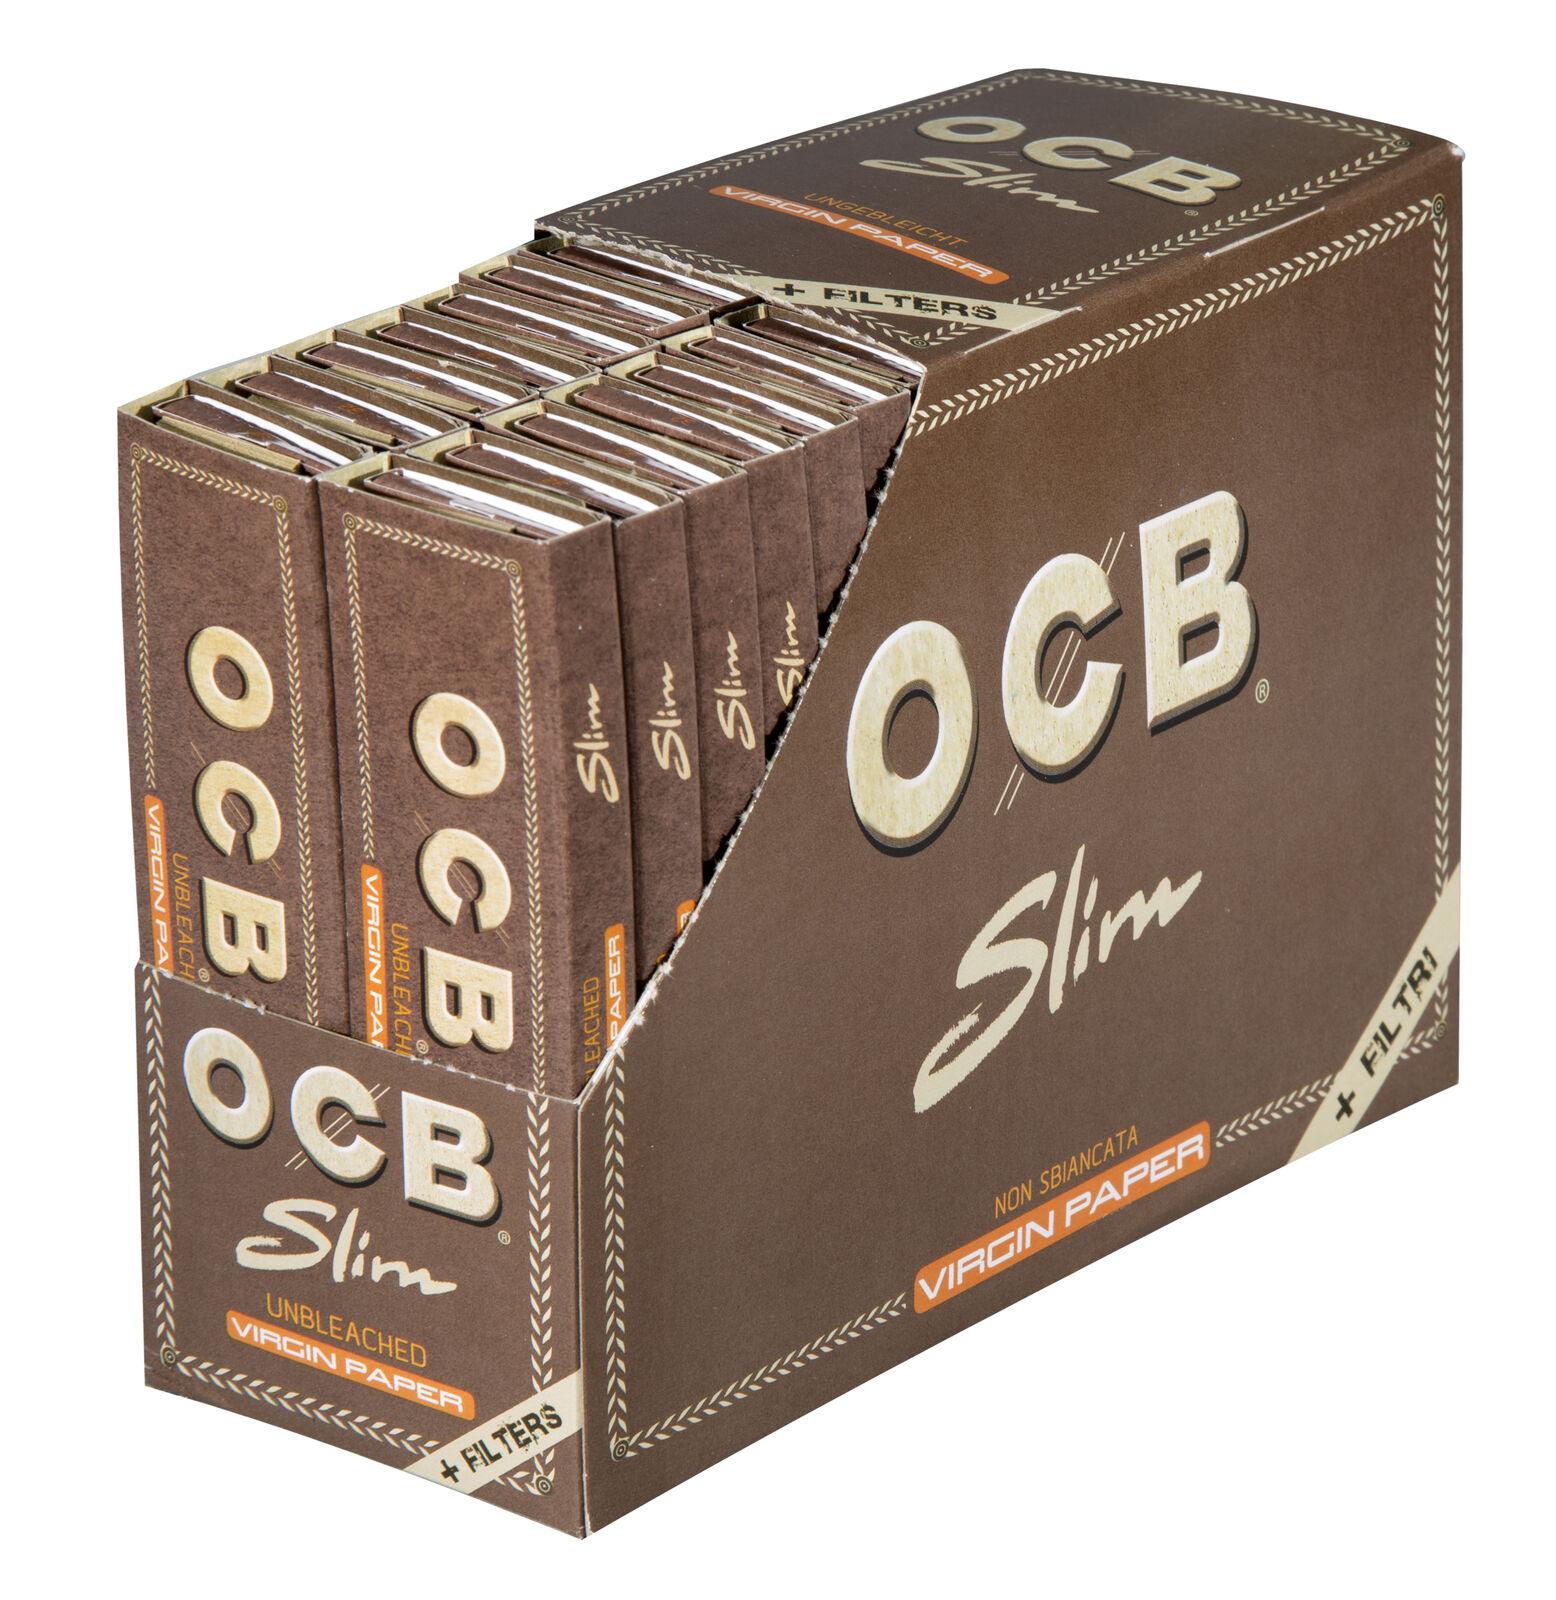 OCB Virgin 32 x 32 Slim Blättchen Filter Tips Unbleached Long Papers